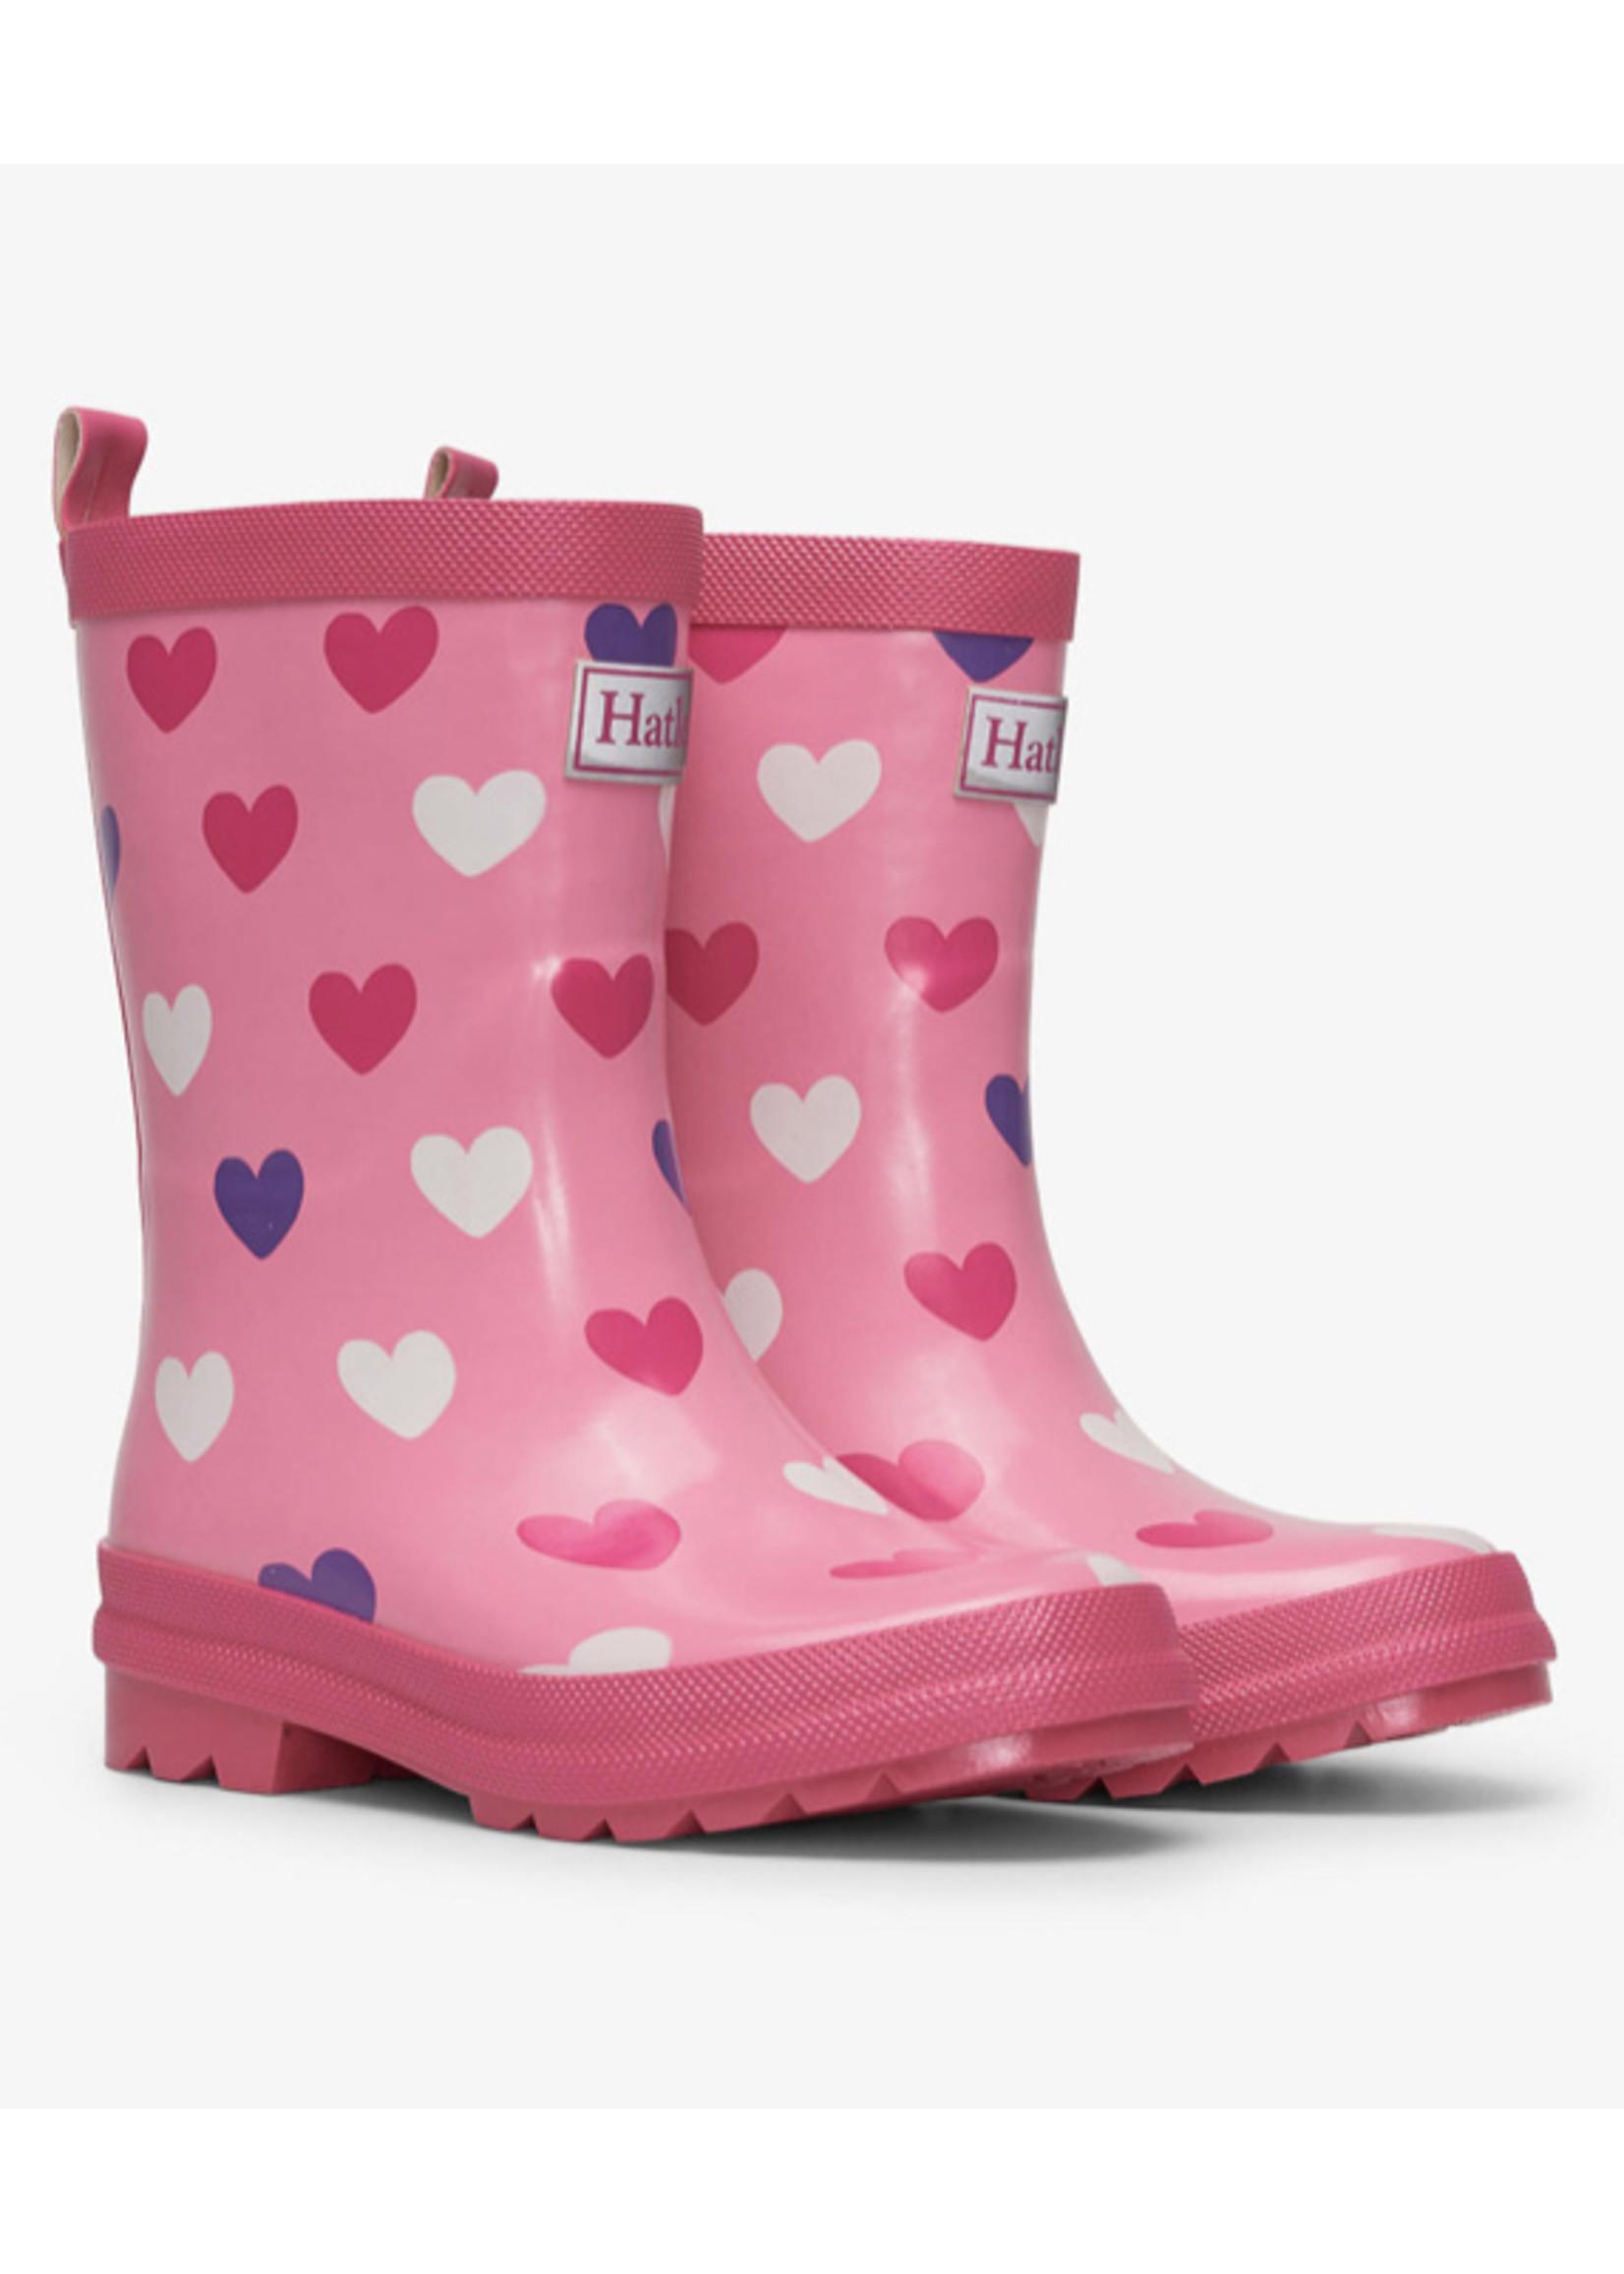 Hatley Hearts Rain Boots